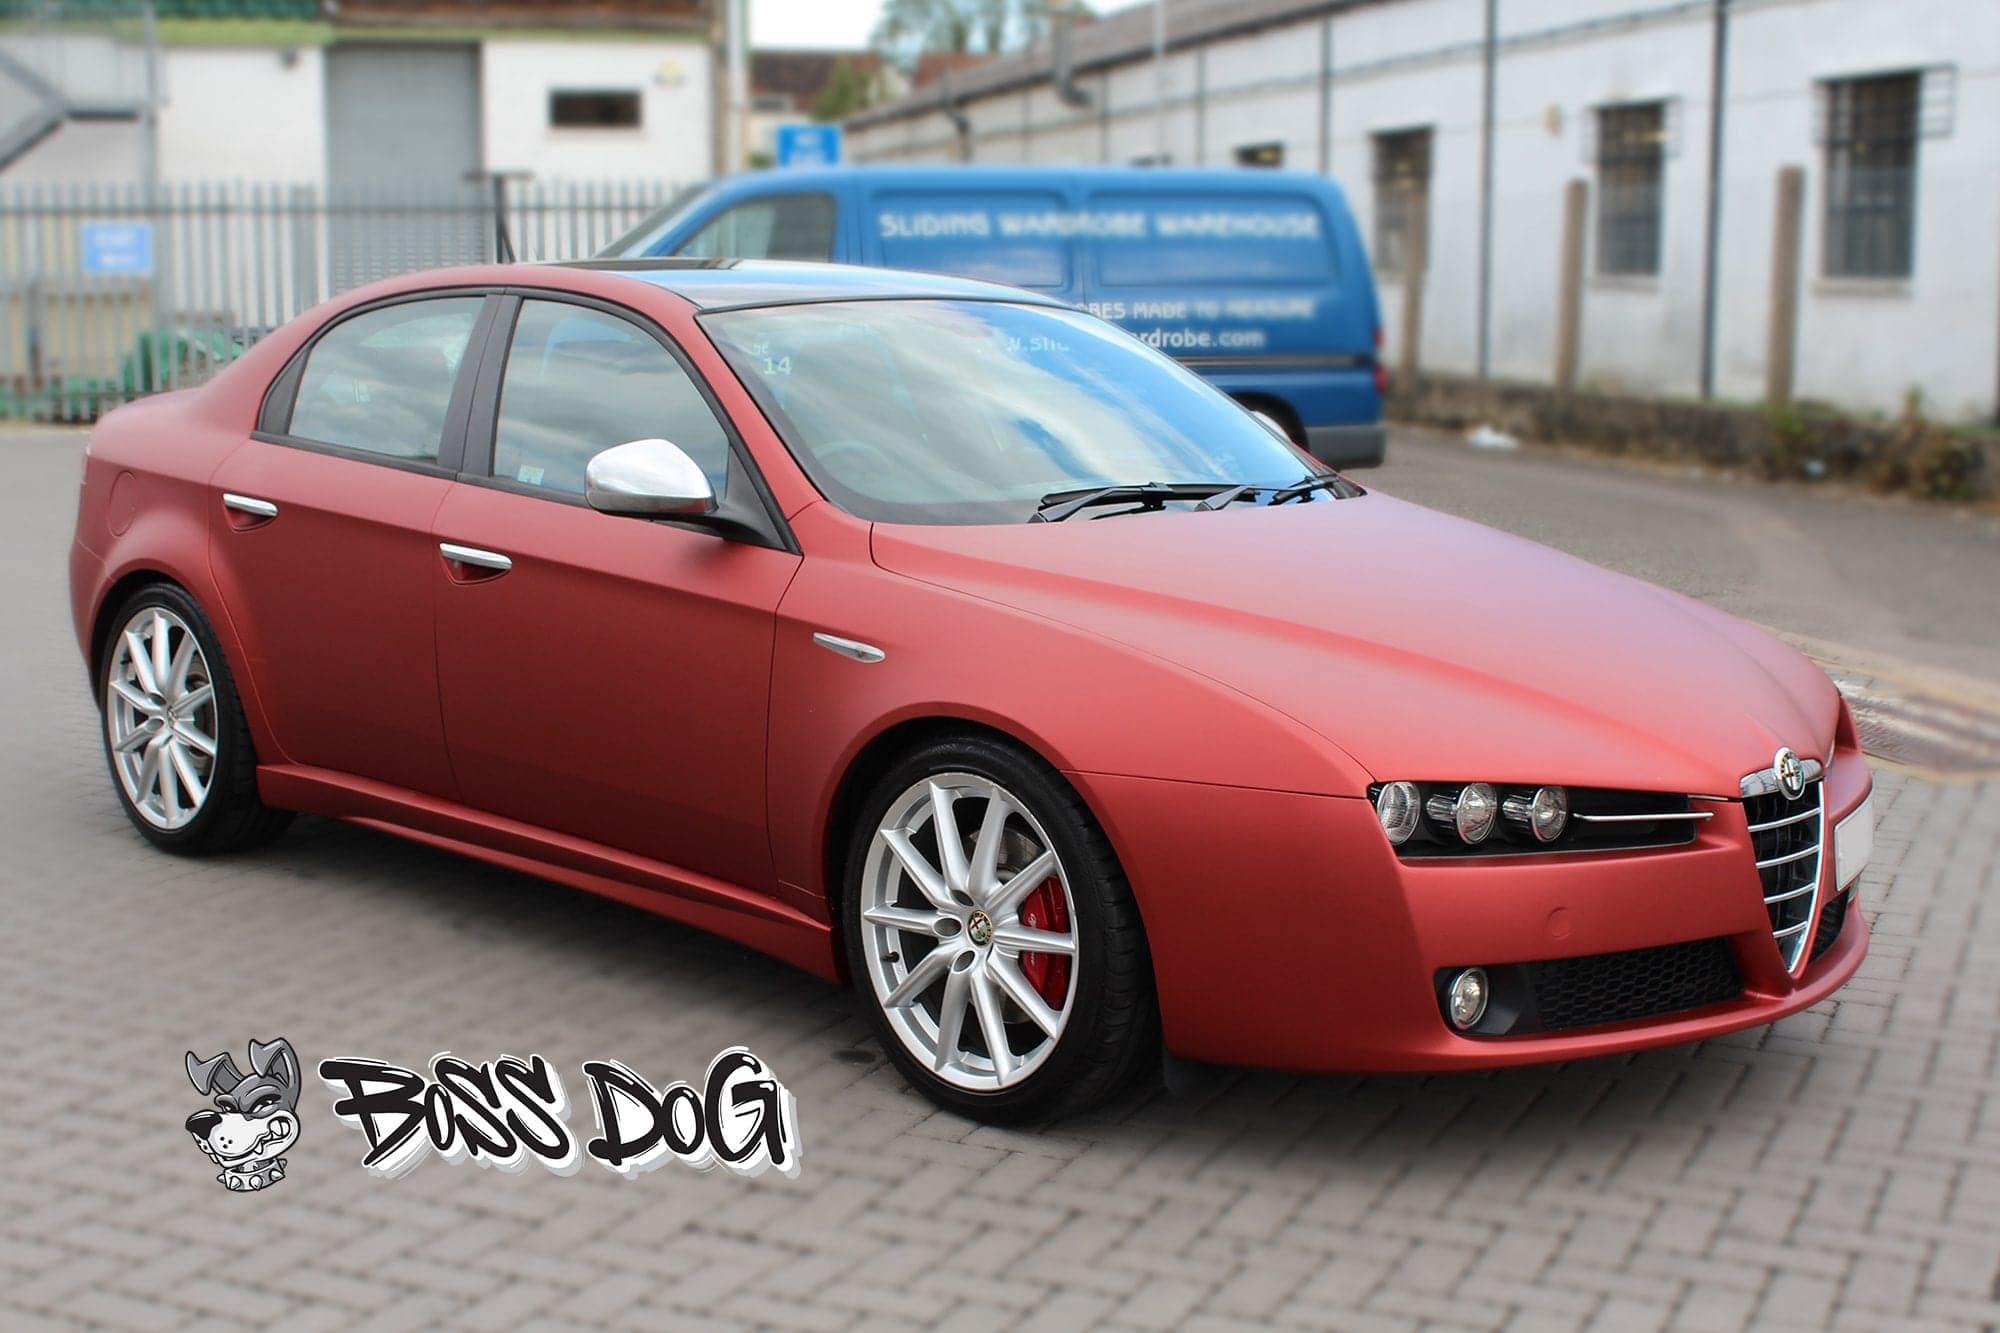 Alfa Romeo 159 wrapped in matt red metallic